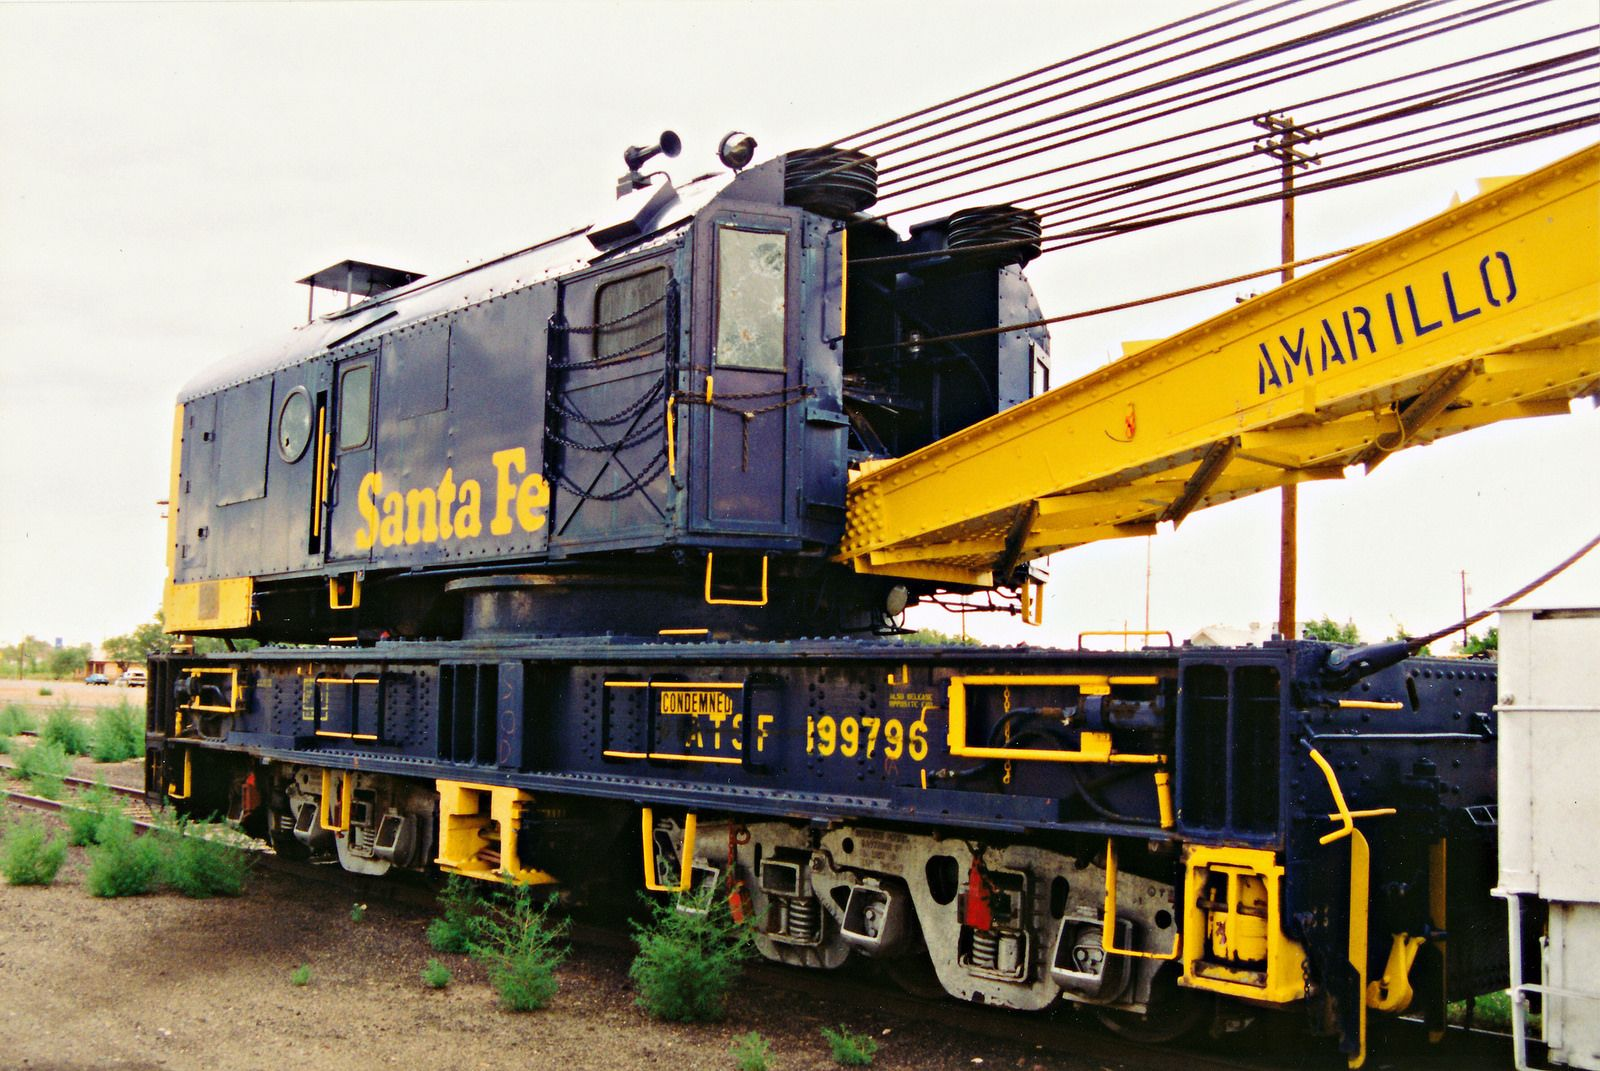 Santa Fes Amarillo Crane No 199796 Railroads Atsf Atchison